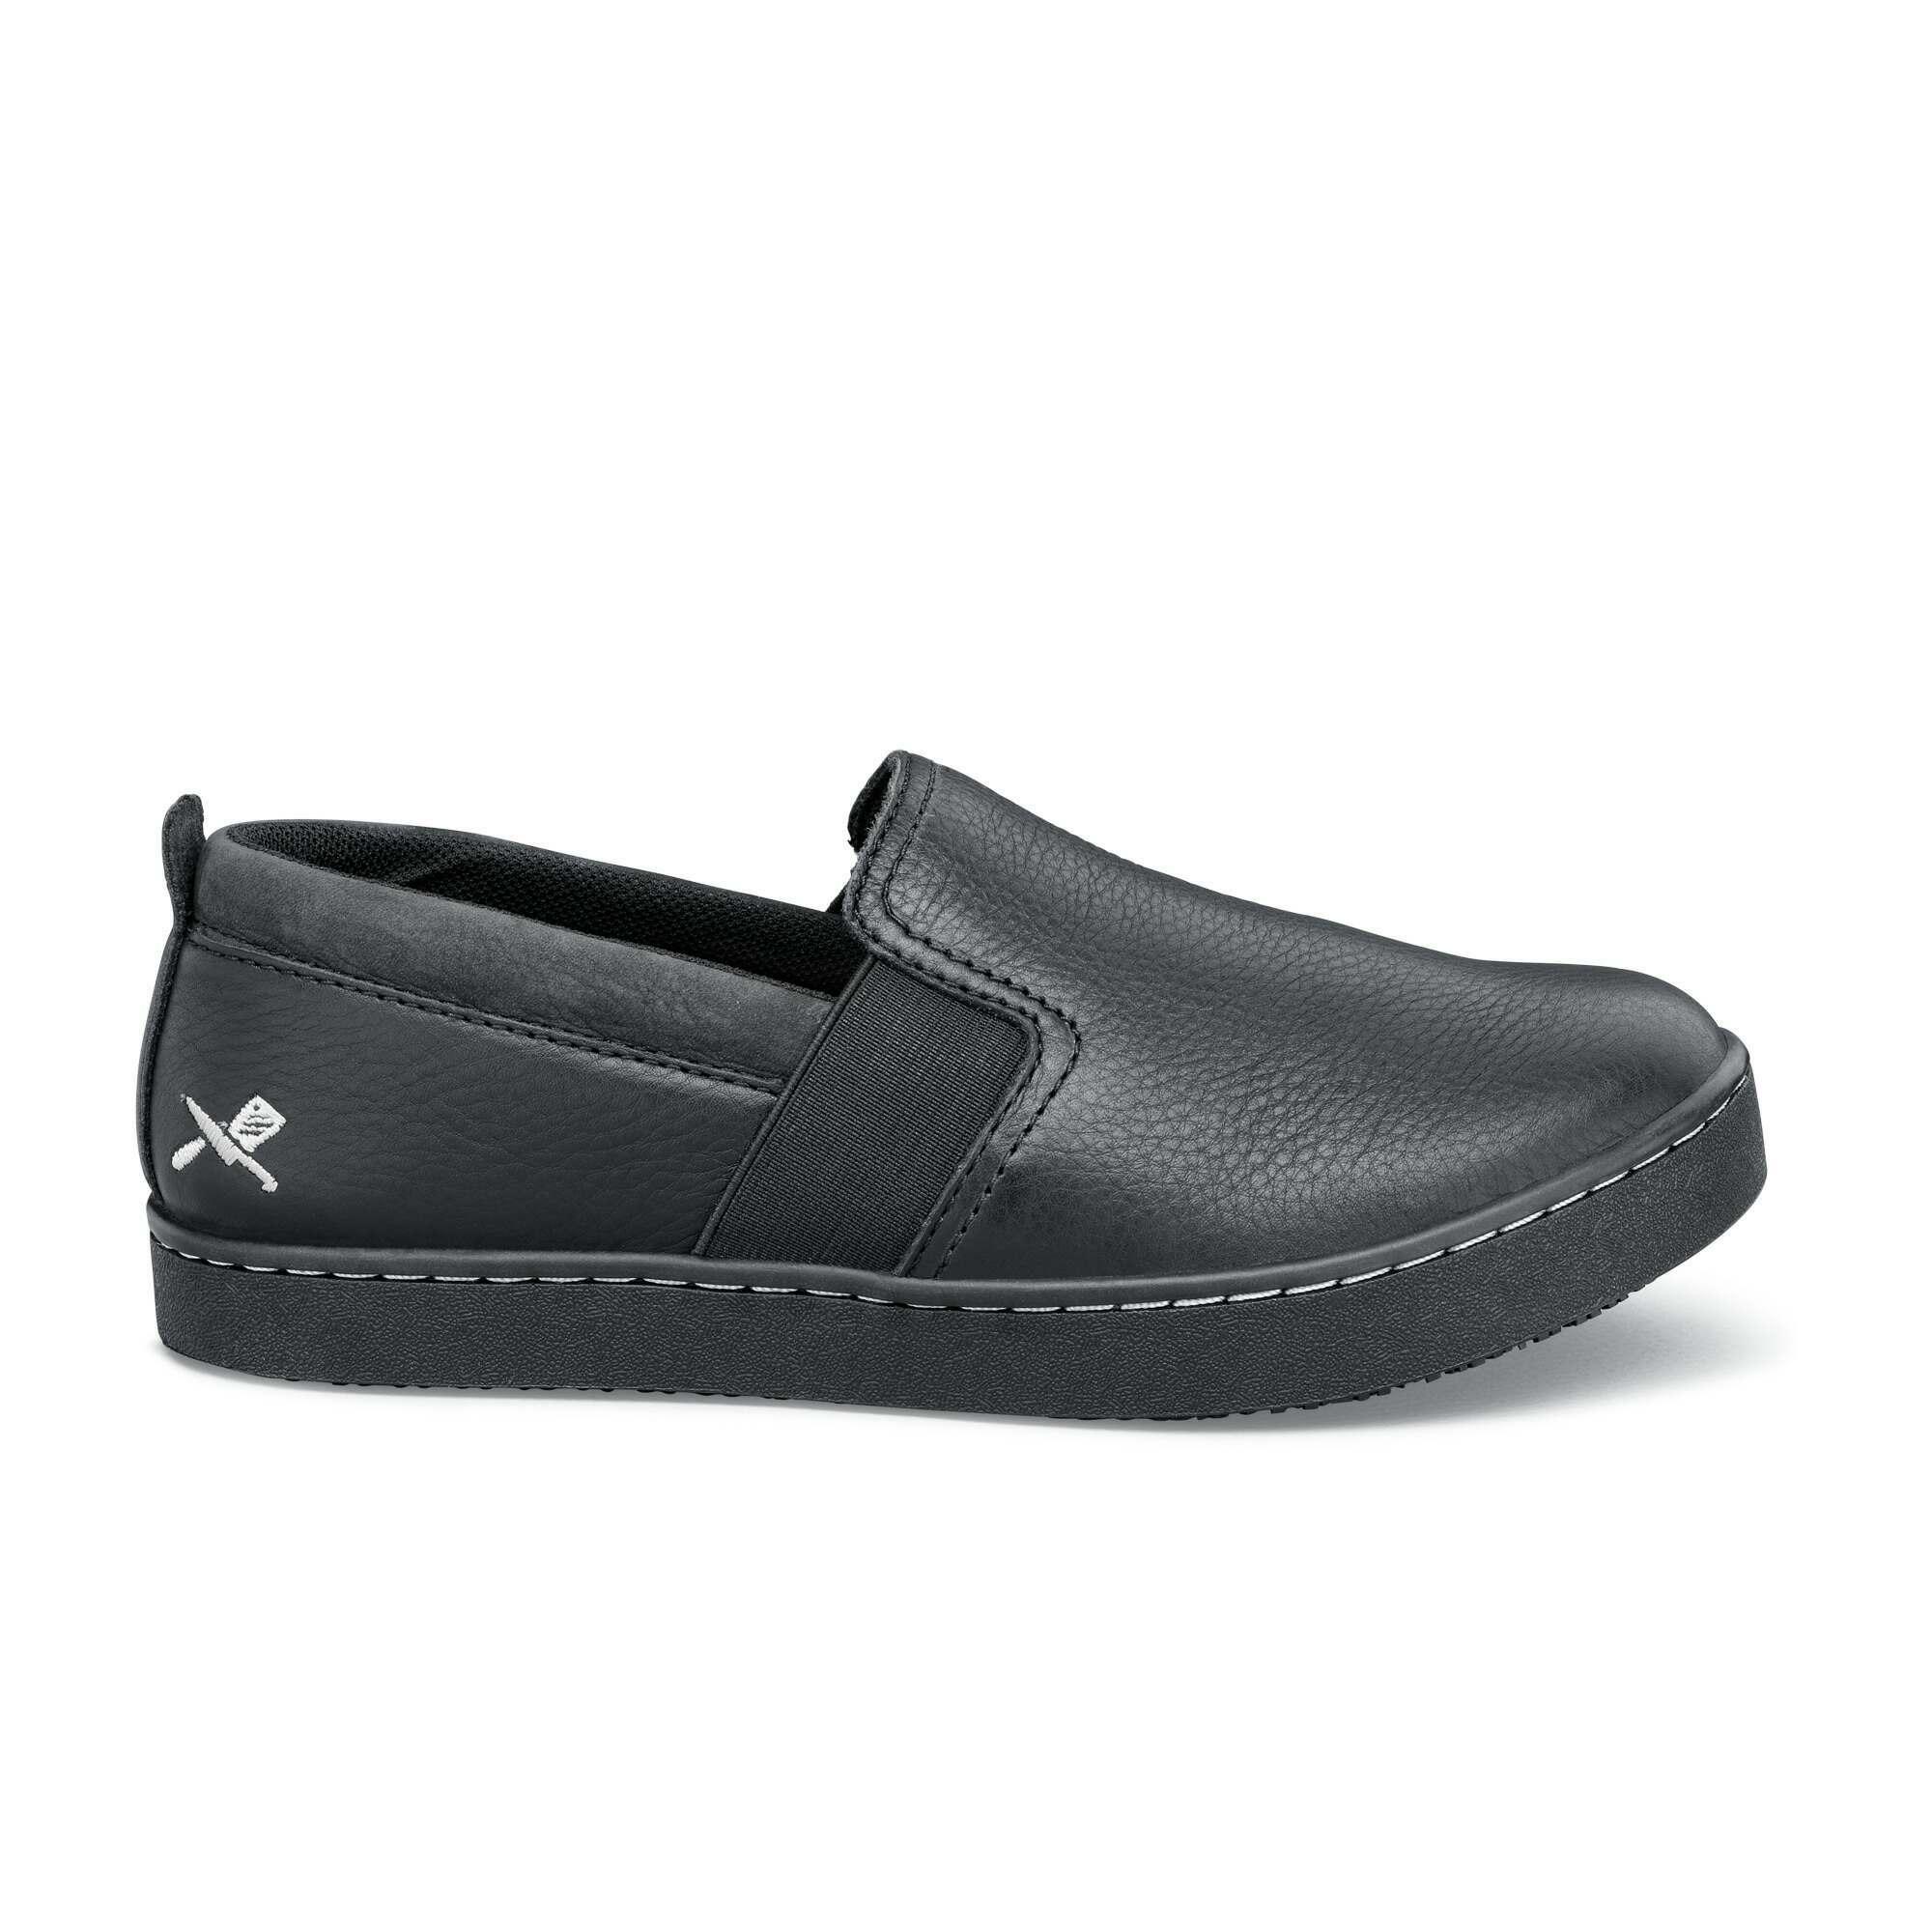 0337468feb284e KAI - BLACK From Shoes For Crews UK